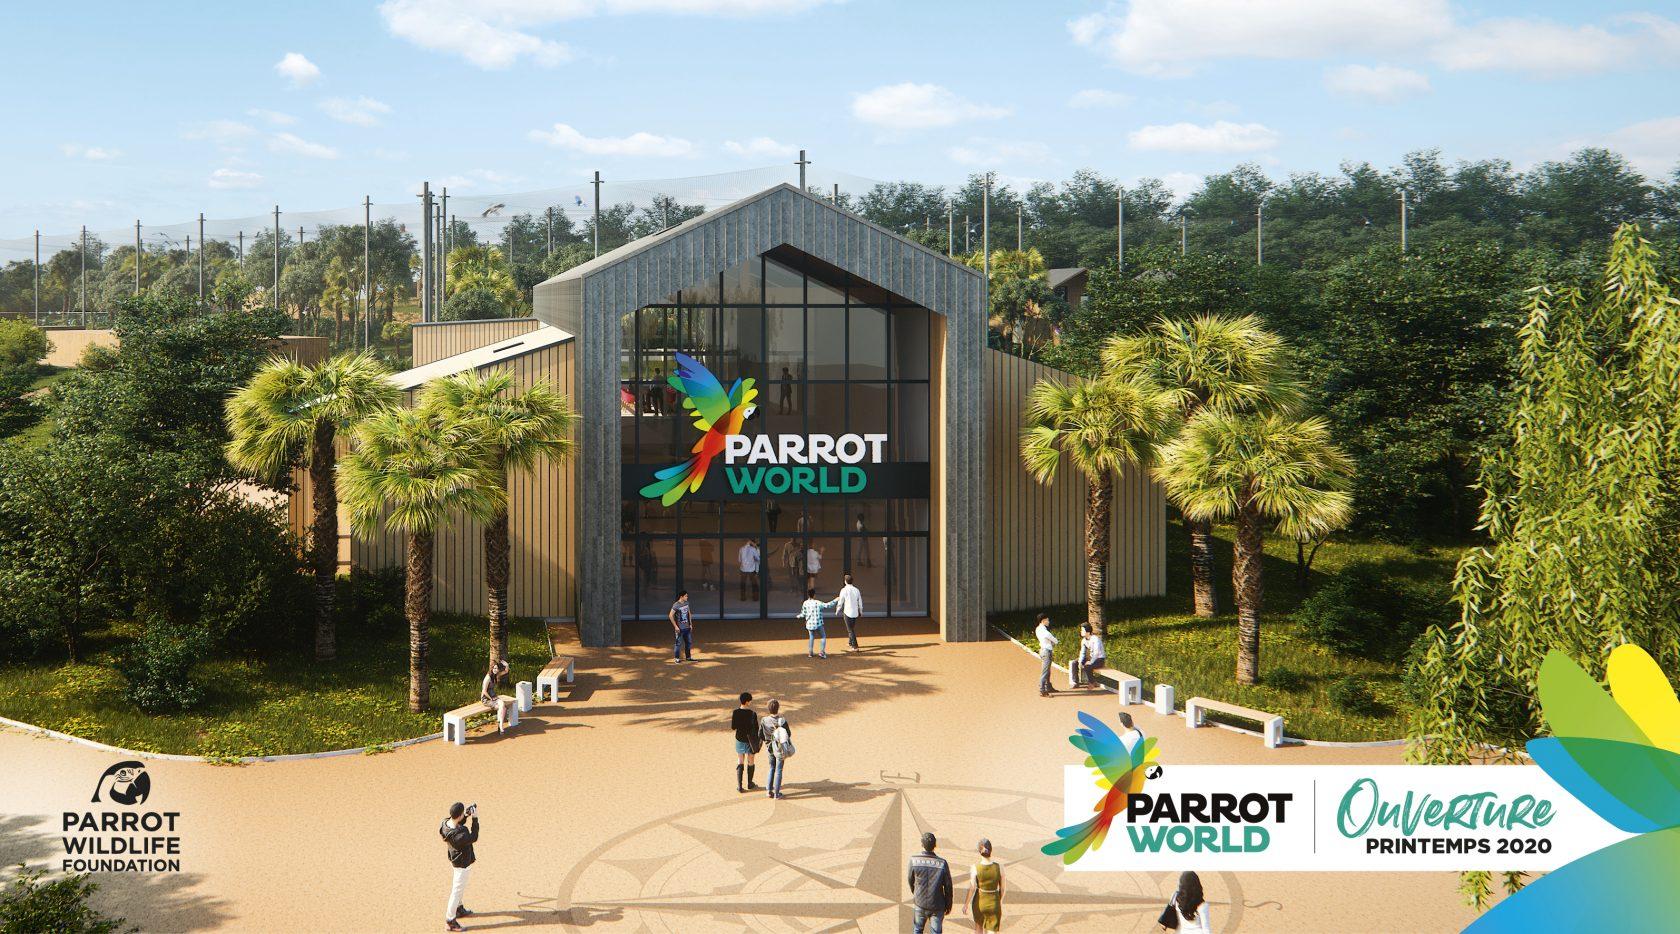 PARROT-WOLRD_Accueil